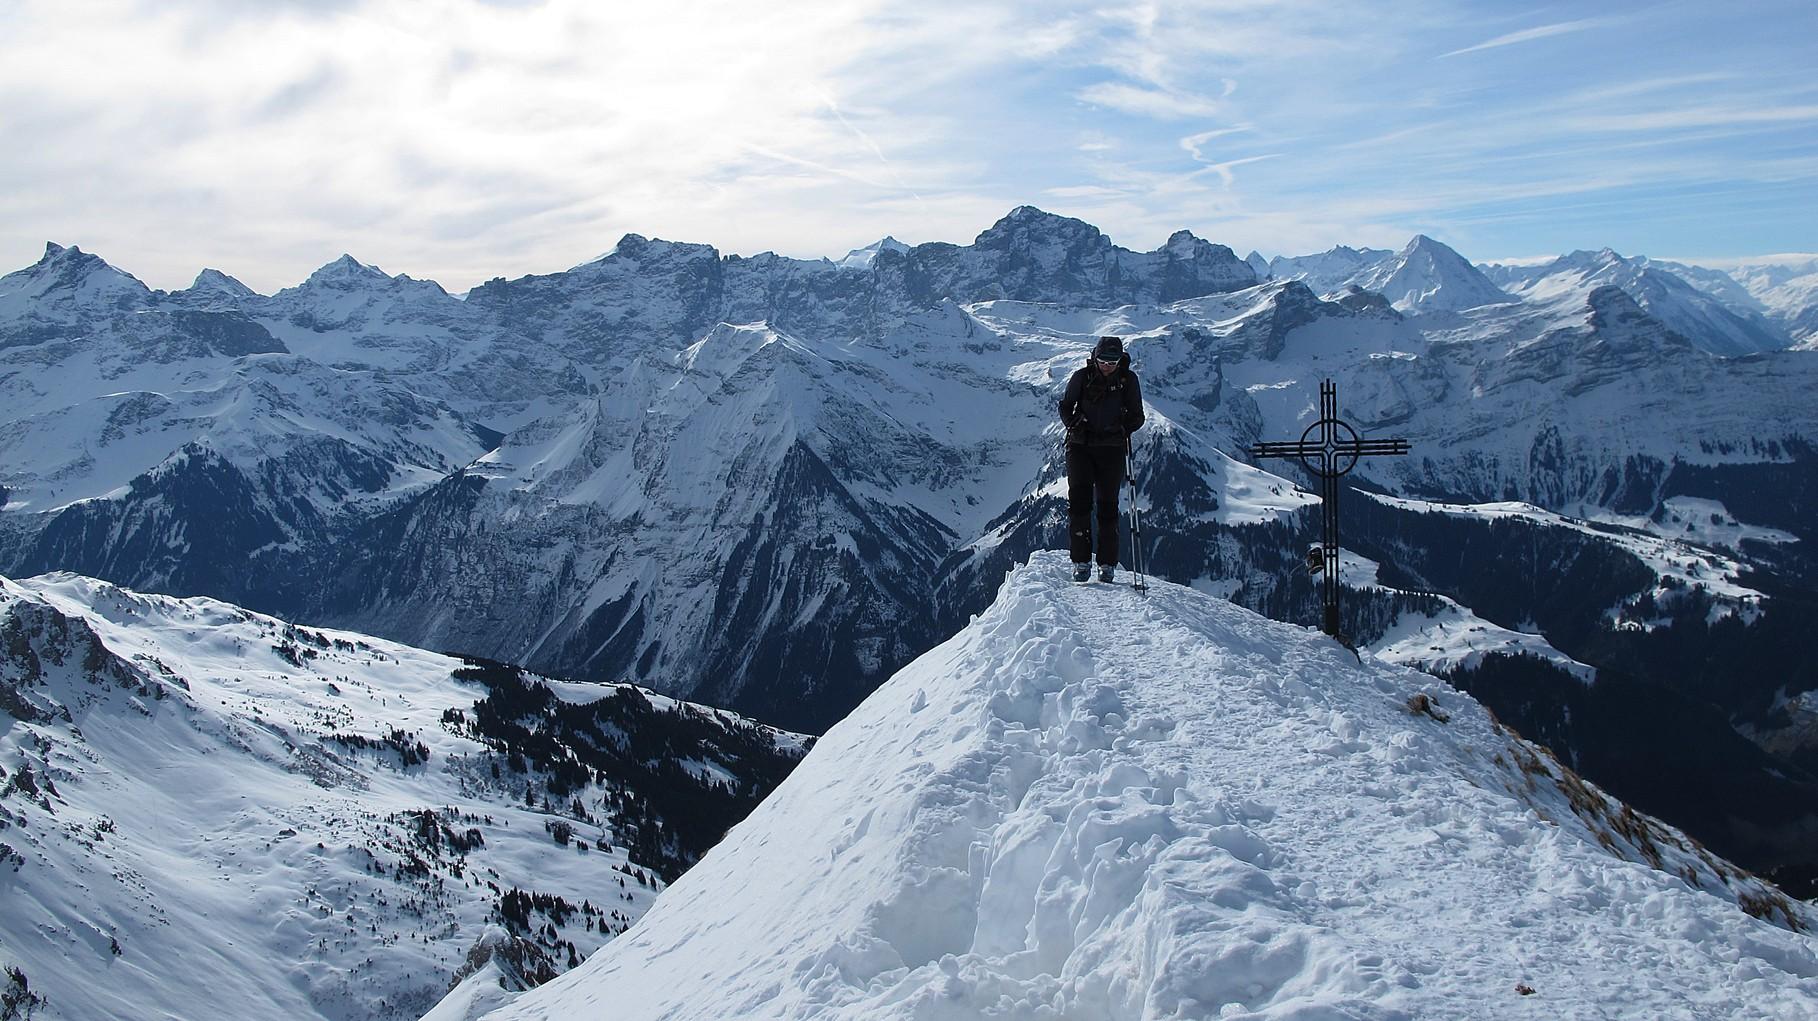 Saebu auf dem windigen Gipfel